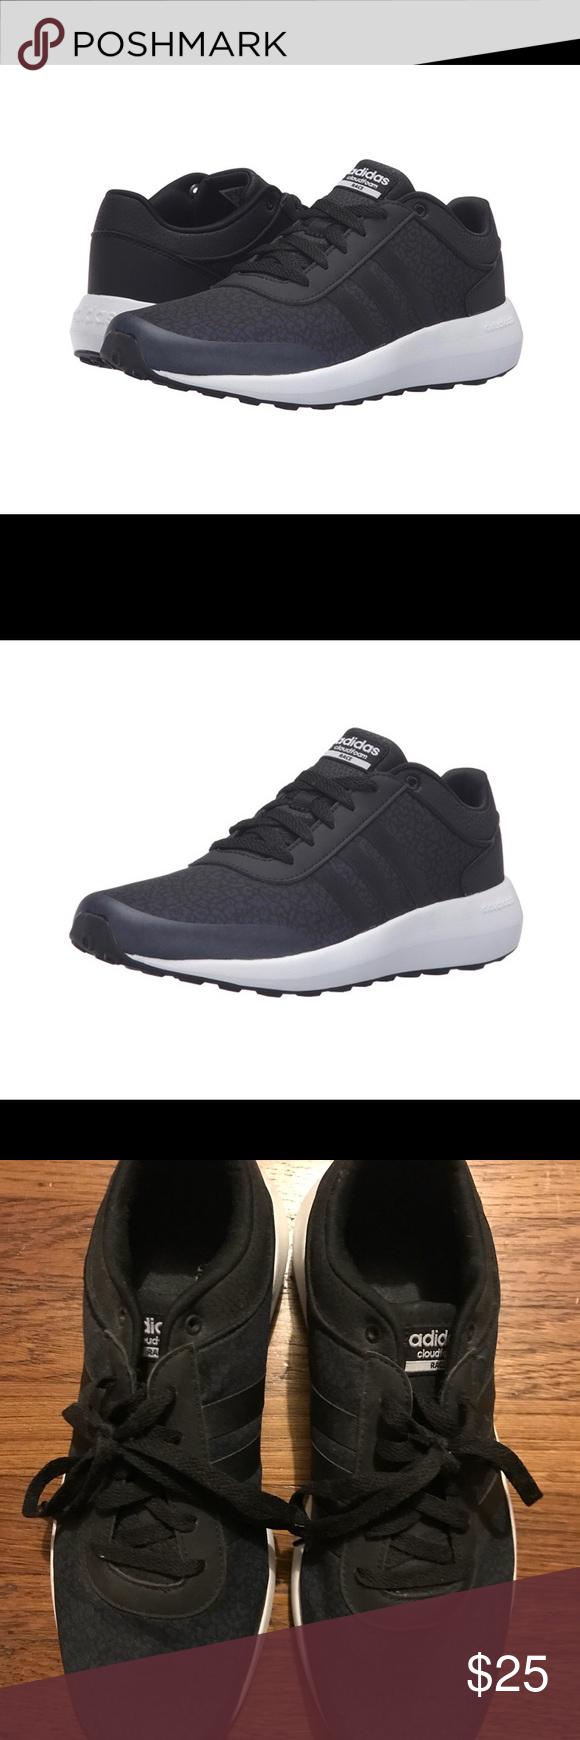 Adidas Neo Cloudfoam Corsa Scarpe Adidas E Scarpe Da Corsa,